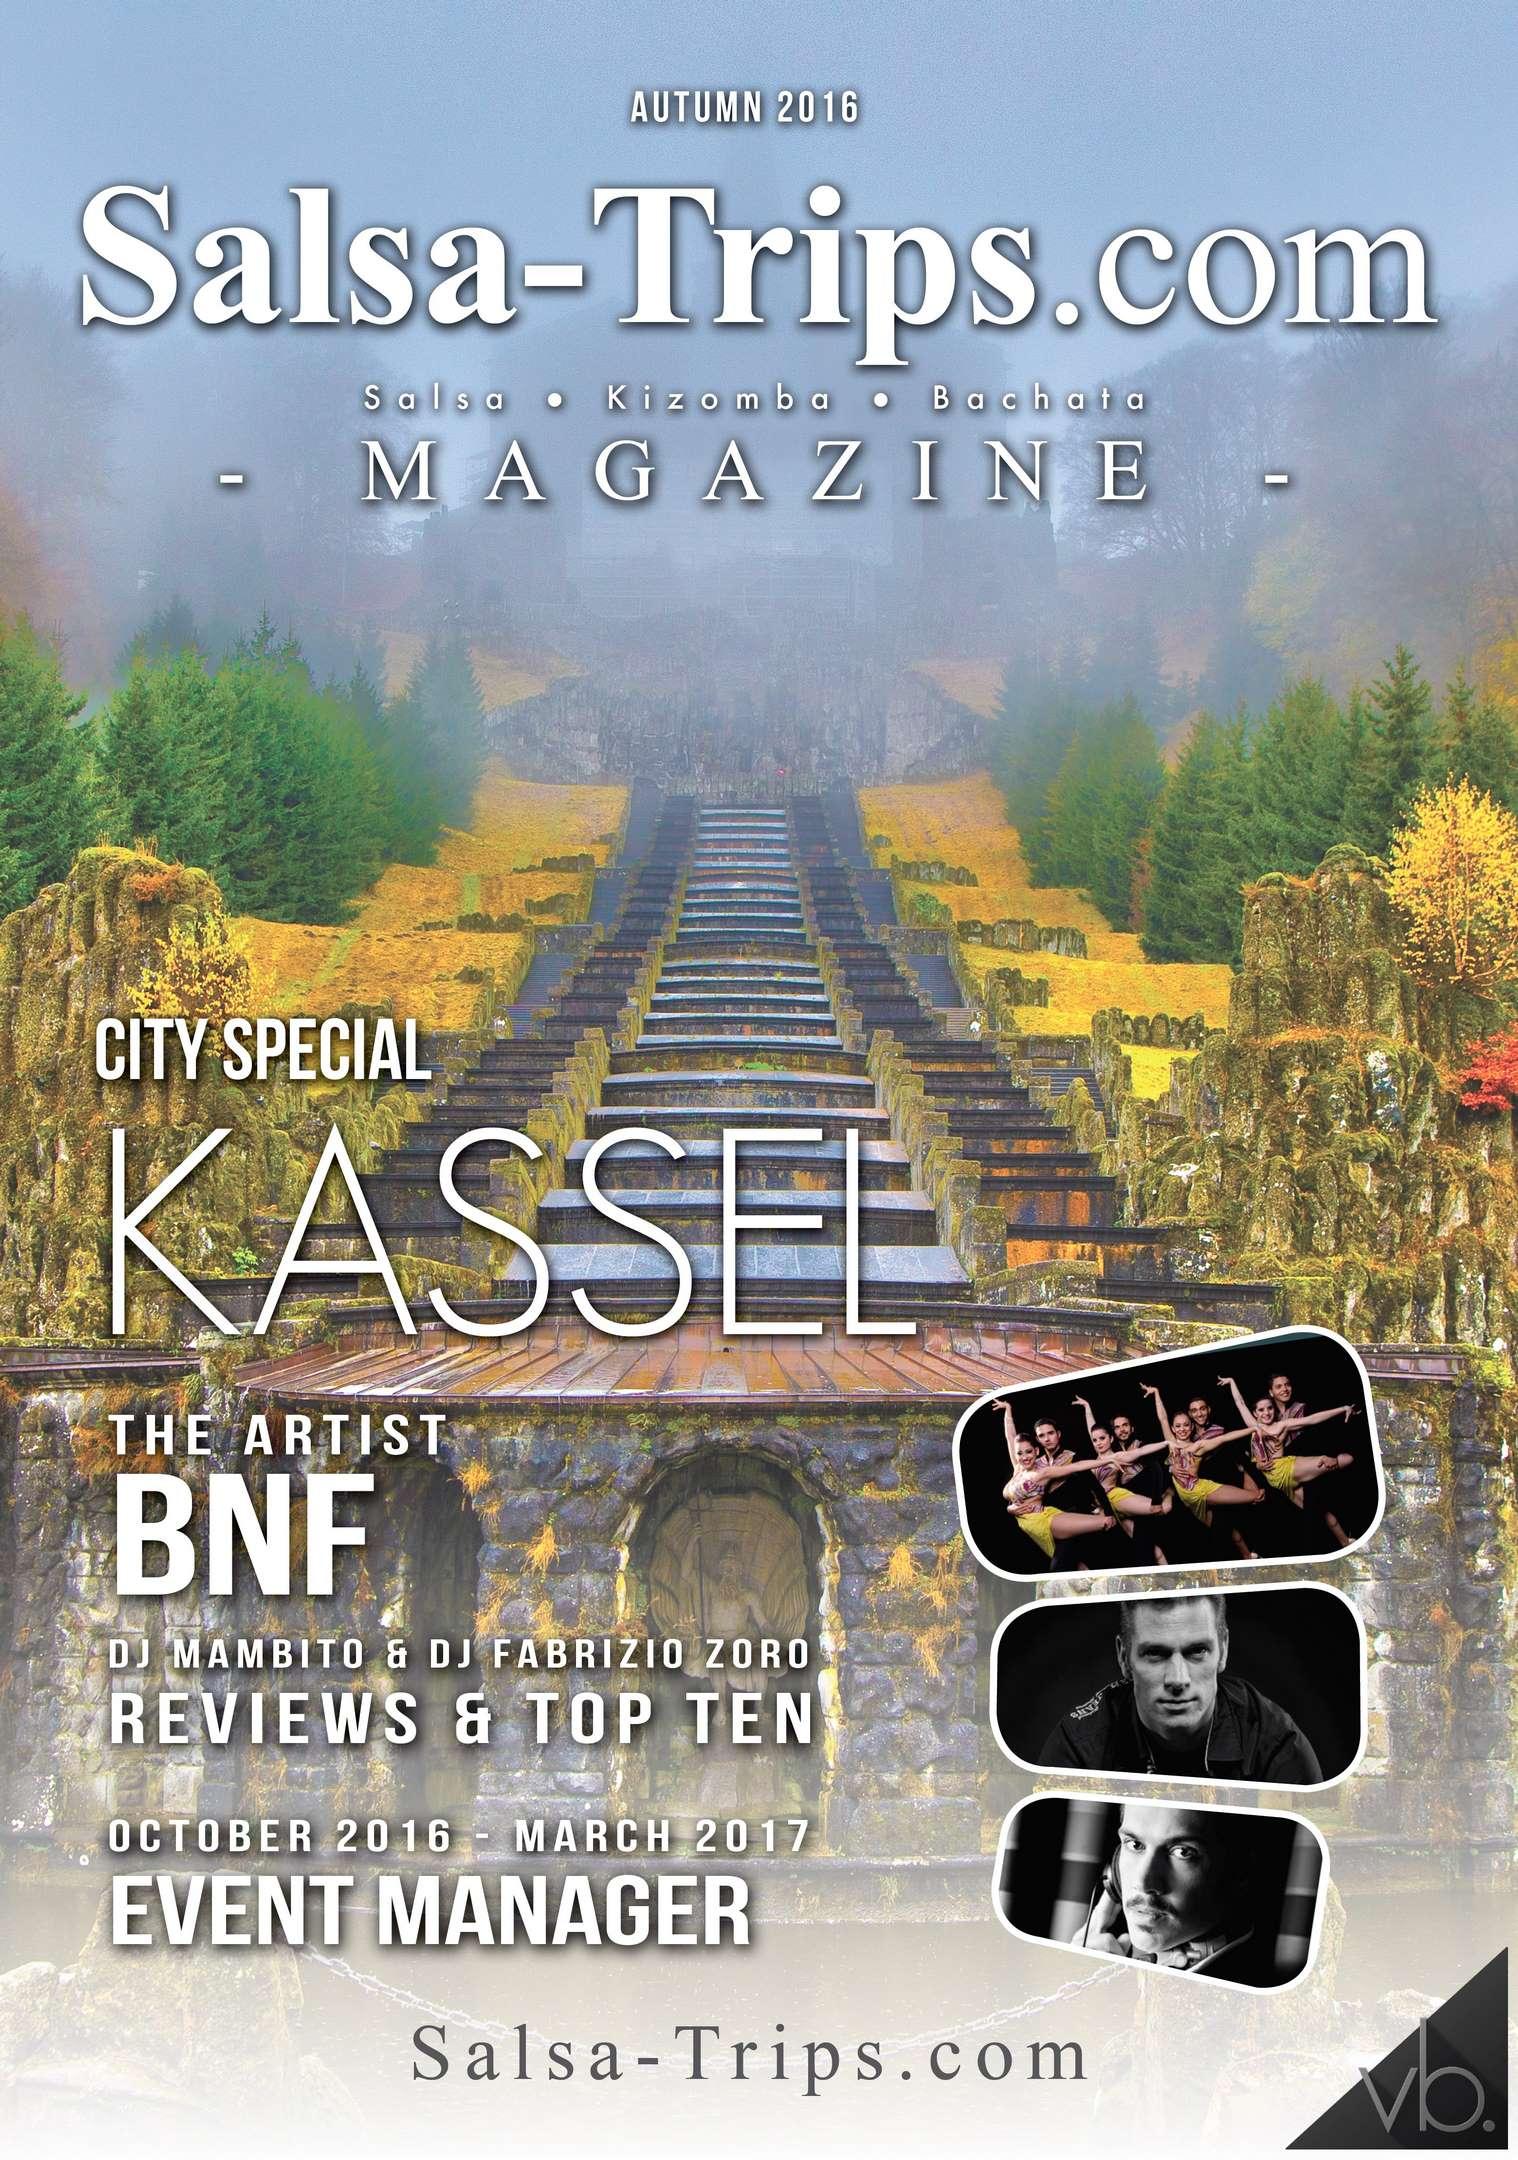 Salsa-Trips.com Magazine Autumn 2016